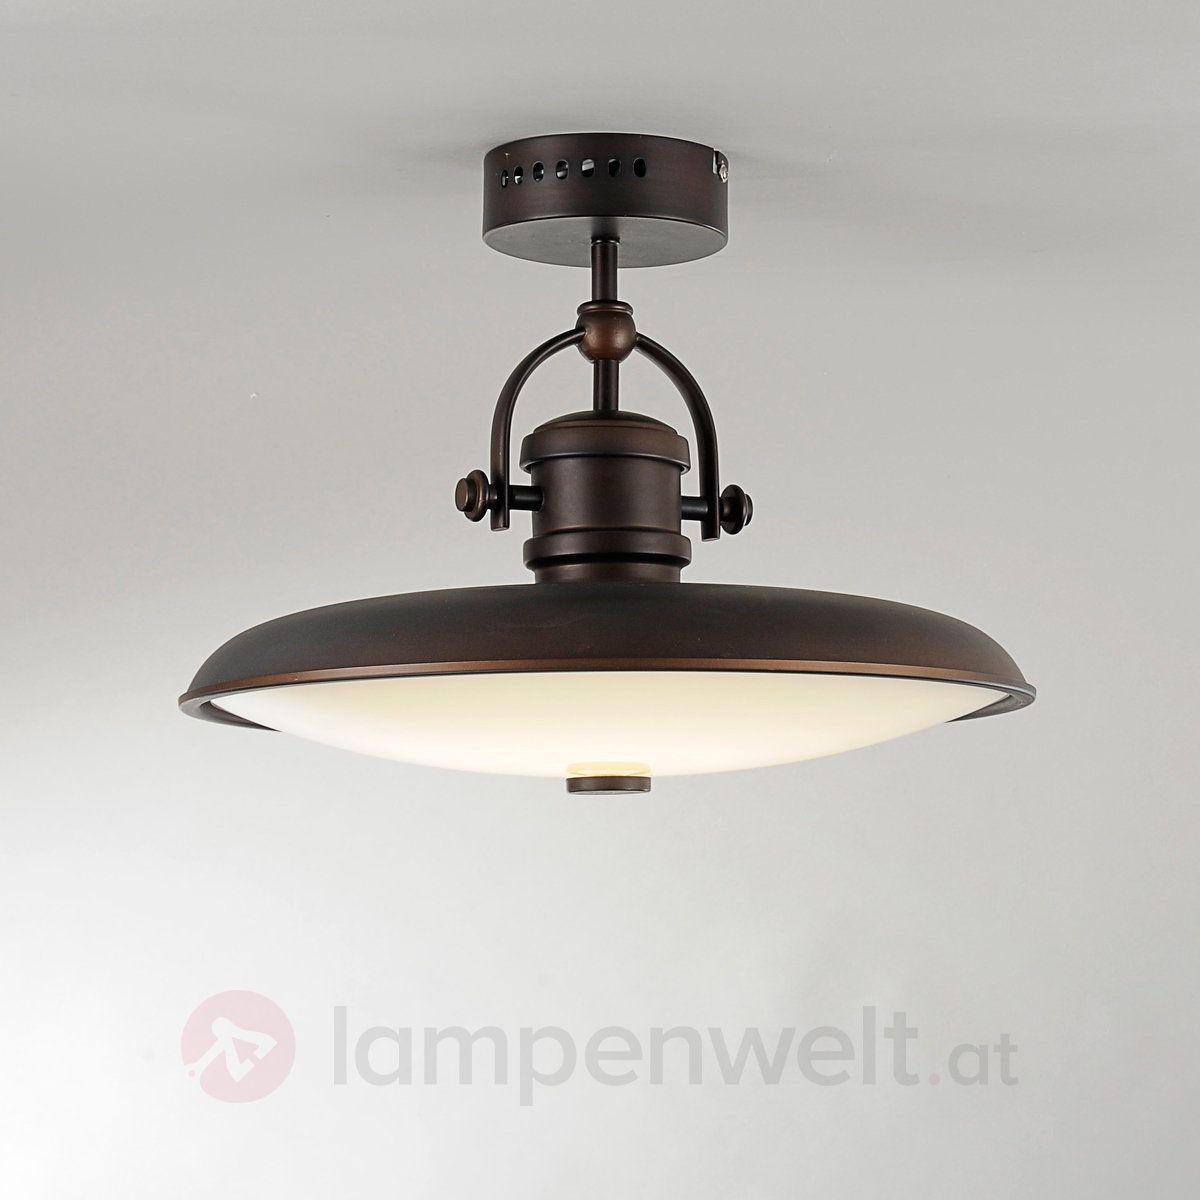 Rustikale LEDDeckenlampe Svende 140 Vorzimmer  Lampen